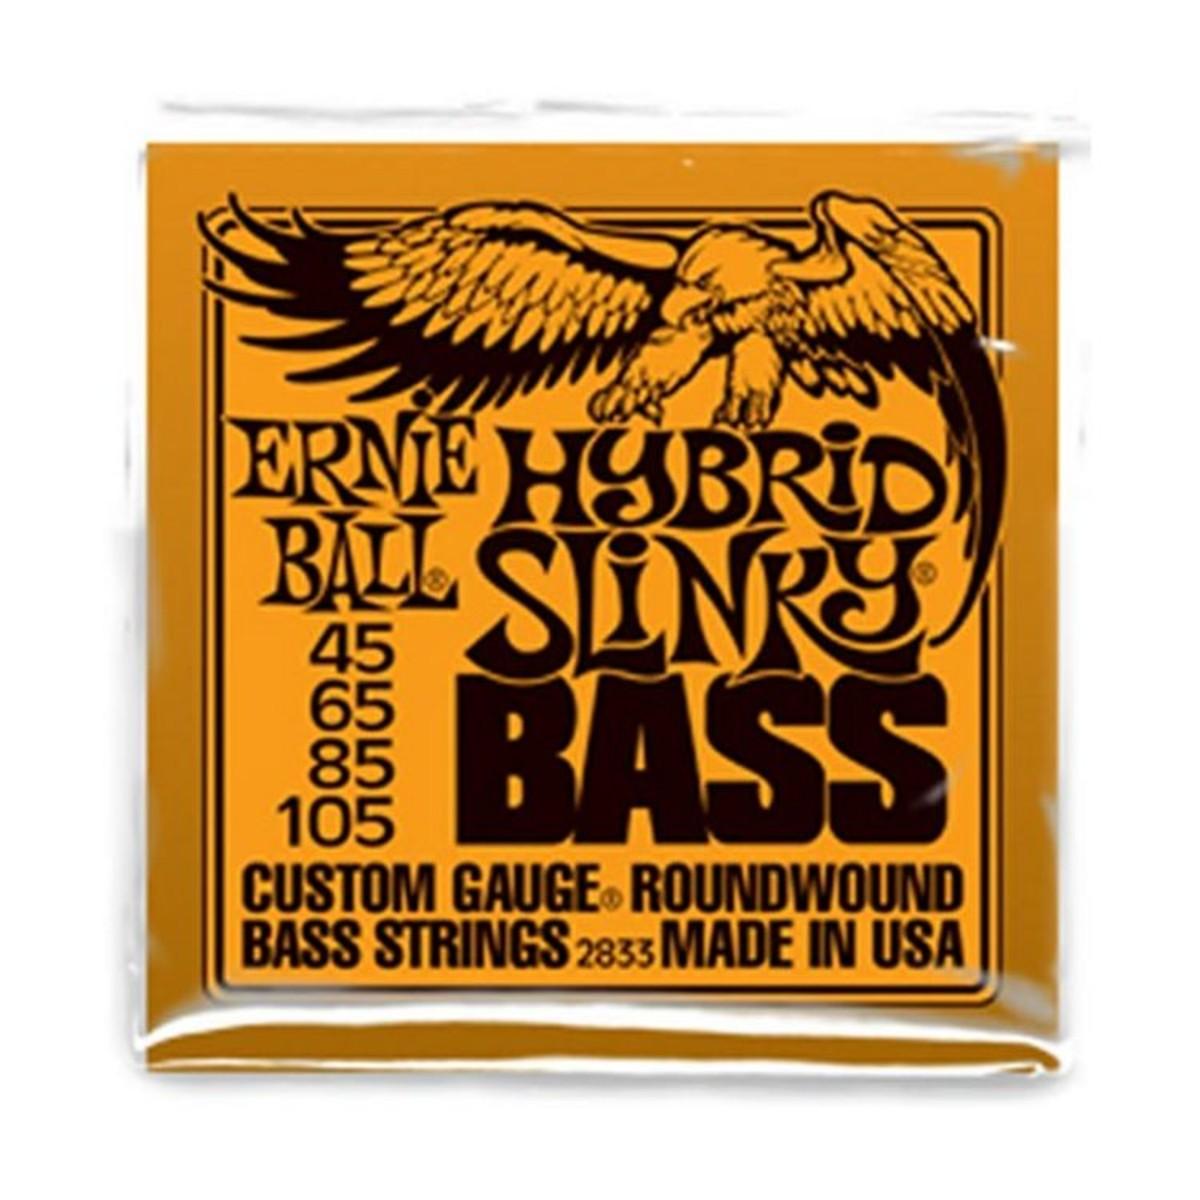 Ernie Ball Hybrid Bass Strings 45 - 105